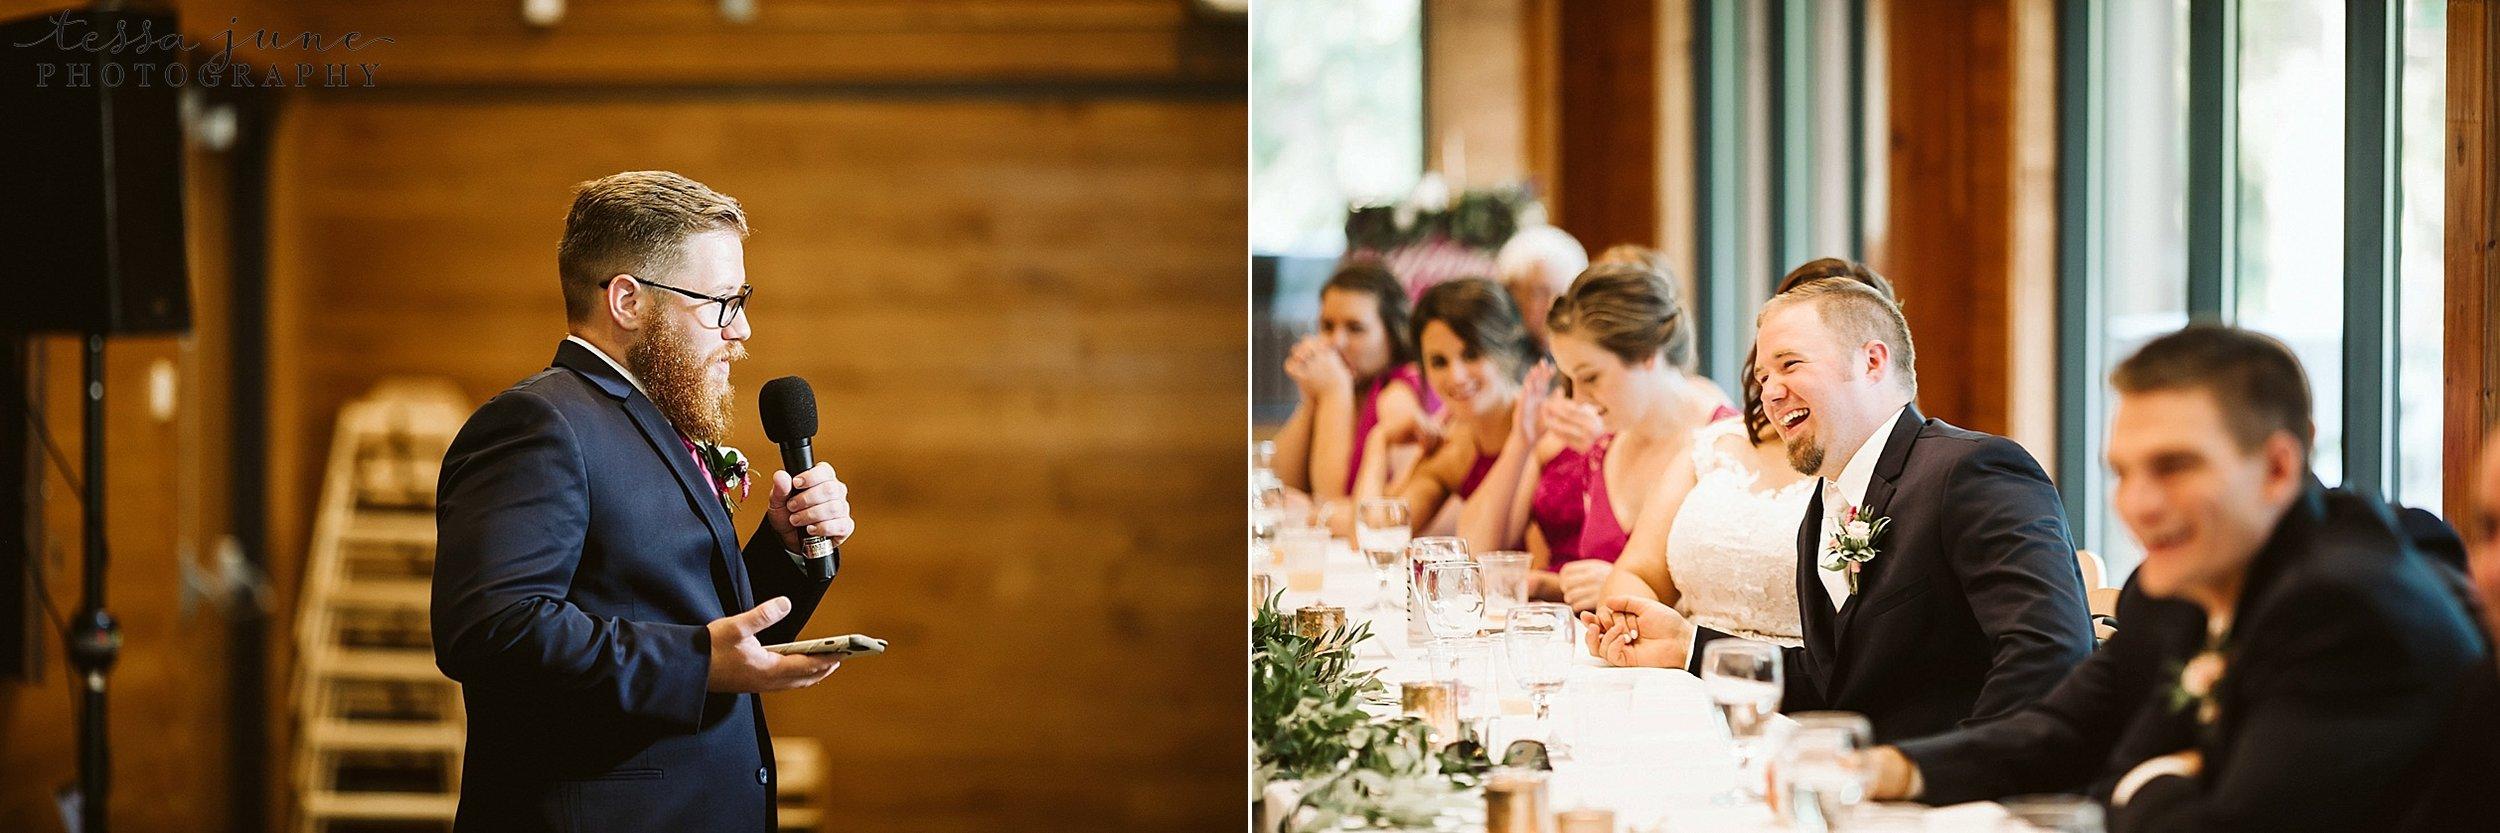 minneapolis-summer-wedding-at-silverwood-park-pristine-floral-124.jpg